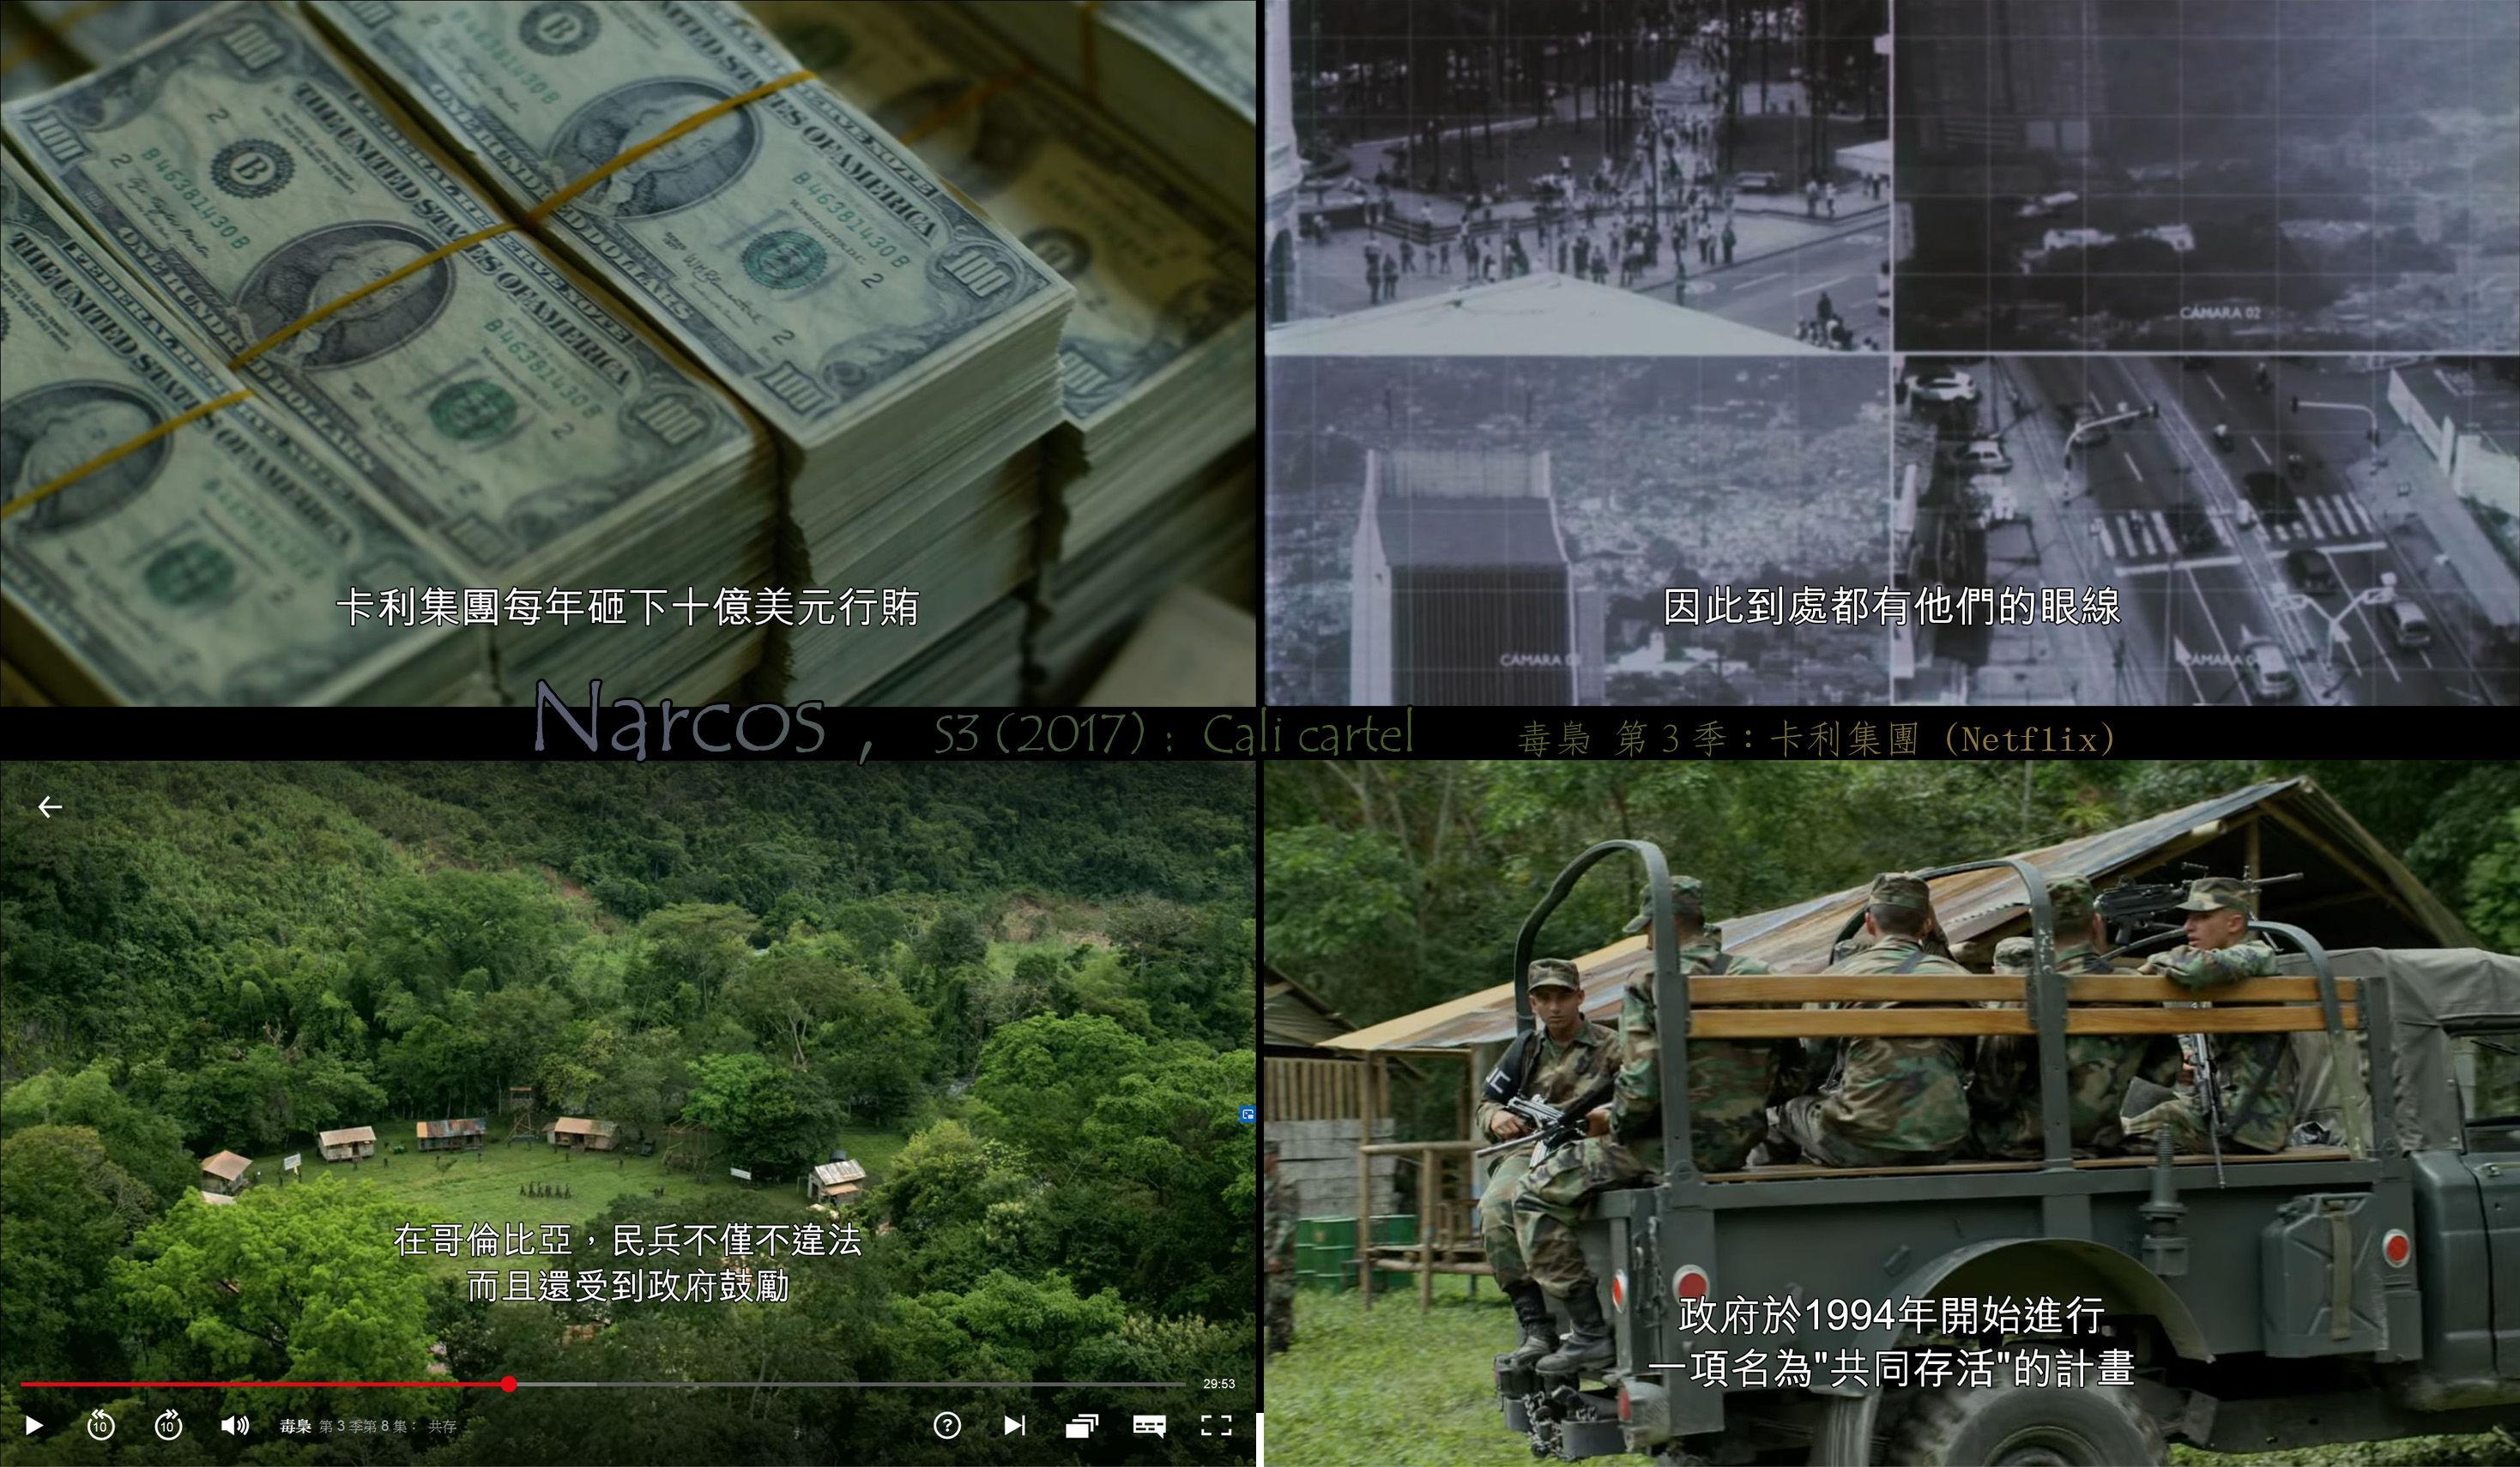 Narcos , S3 (2017) Cali cartel 毒梟 第3季:卡利集團 (Netflix).jpg